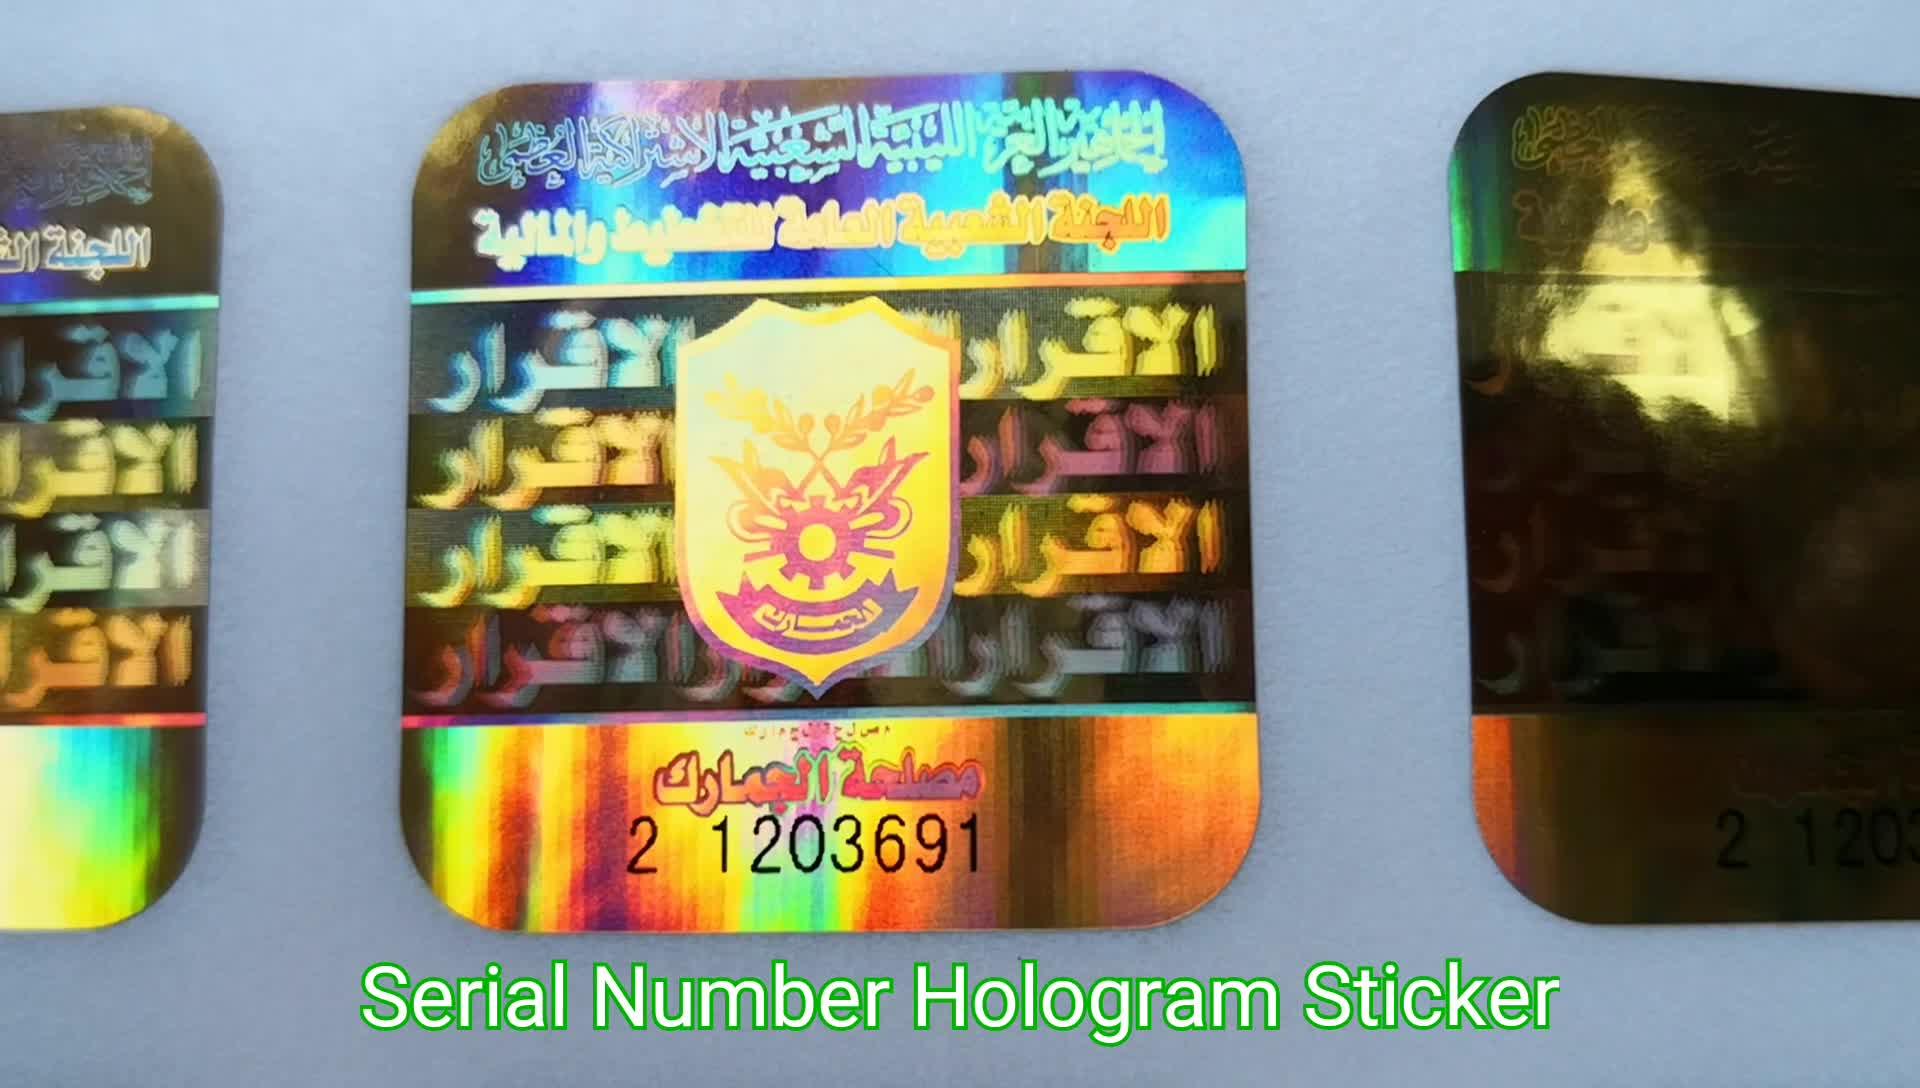 Circular Custom Tamper Proof Hologram Stickers with serial numbers